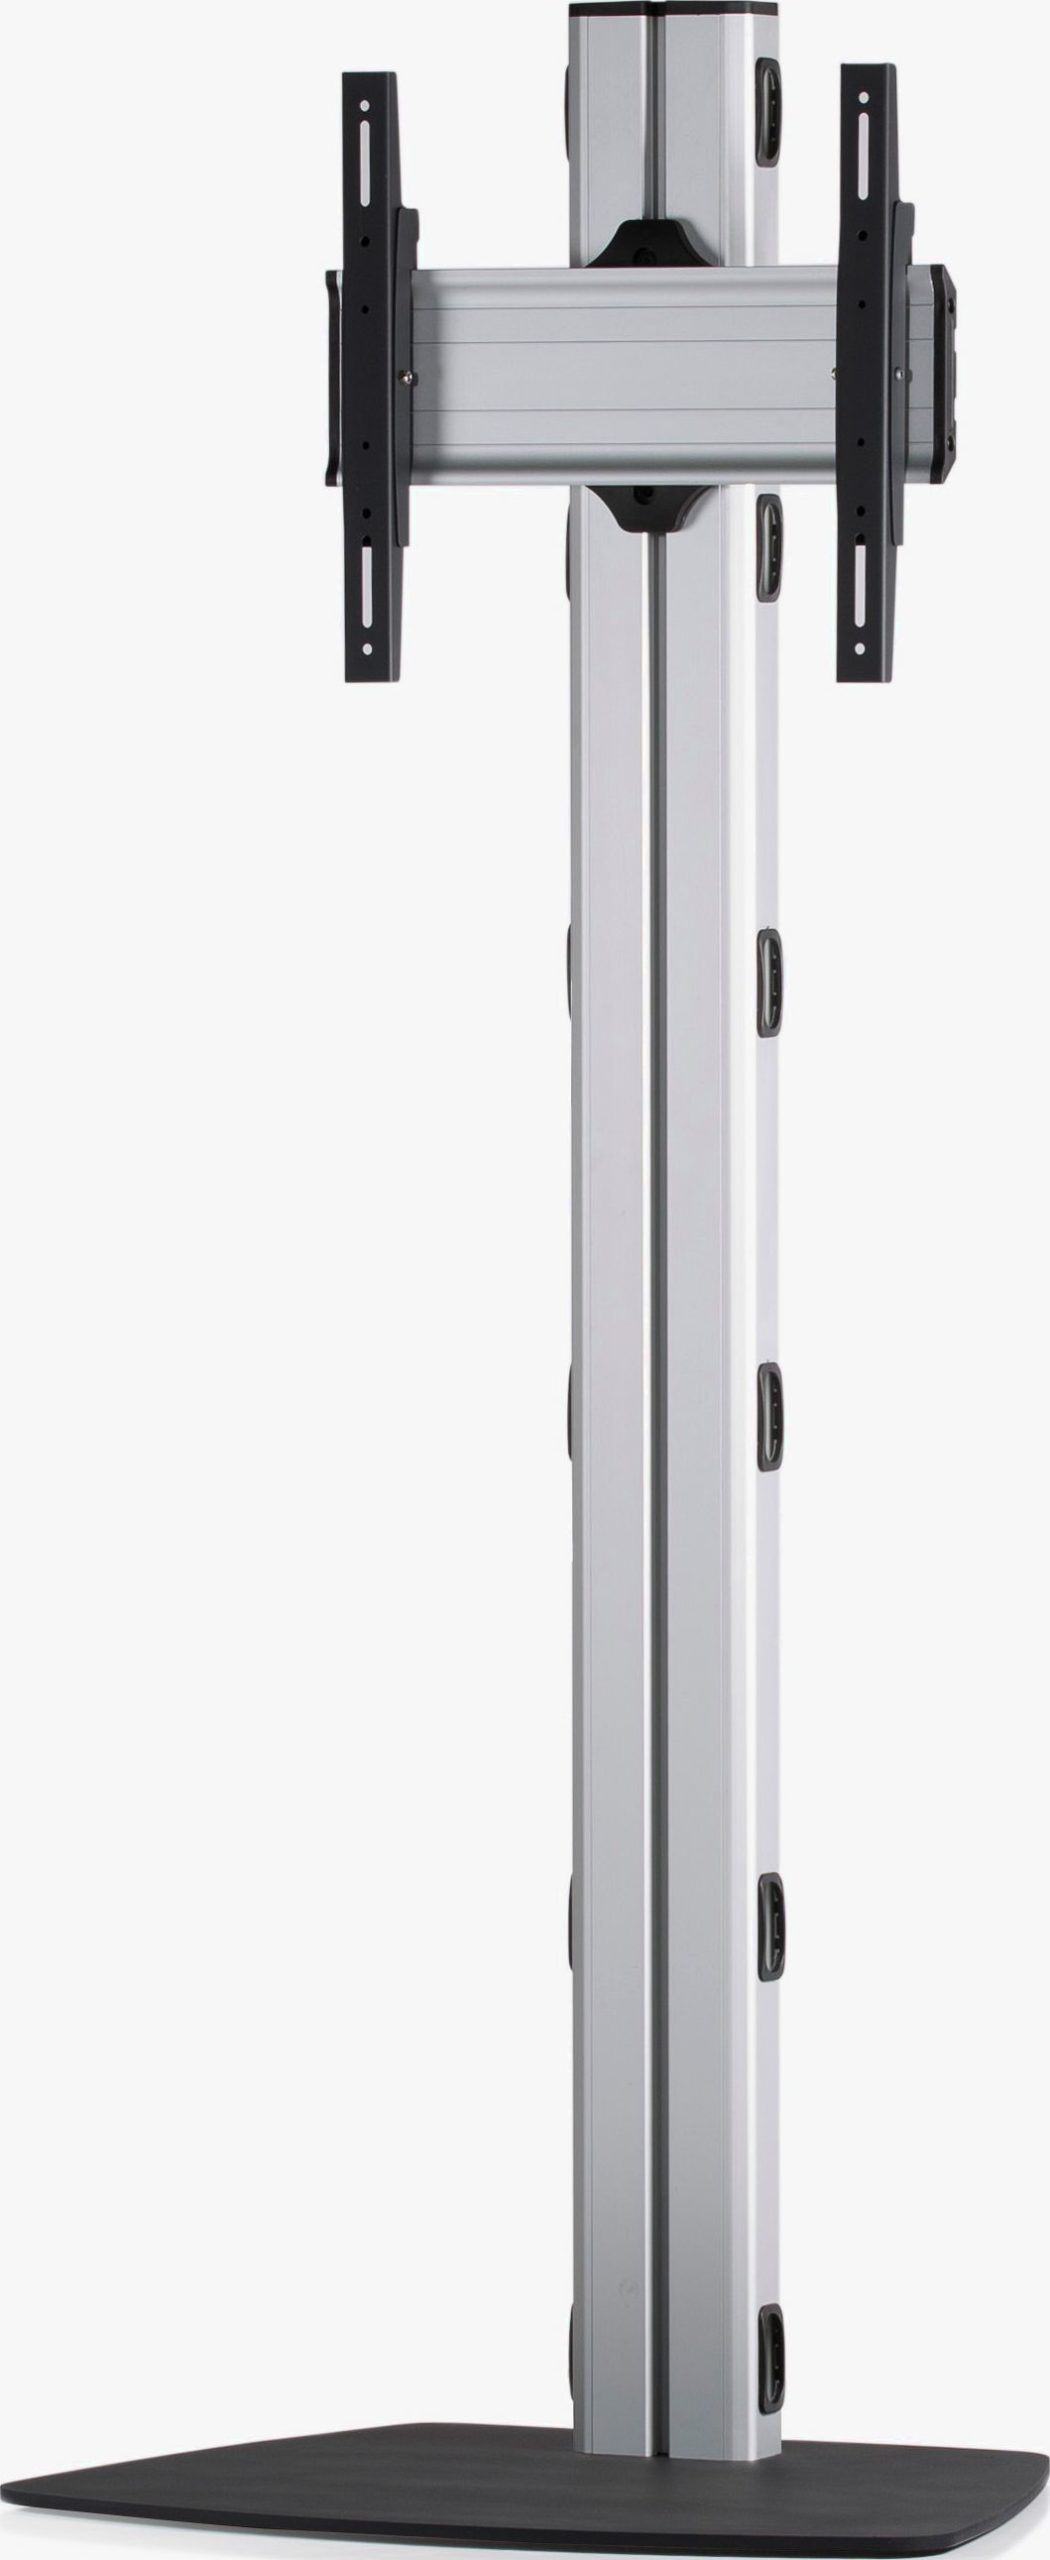 1 Display 1×1, Höhe 180 cm, Standard-VESA, mit Standfuß